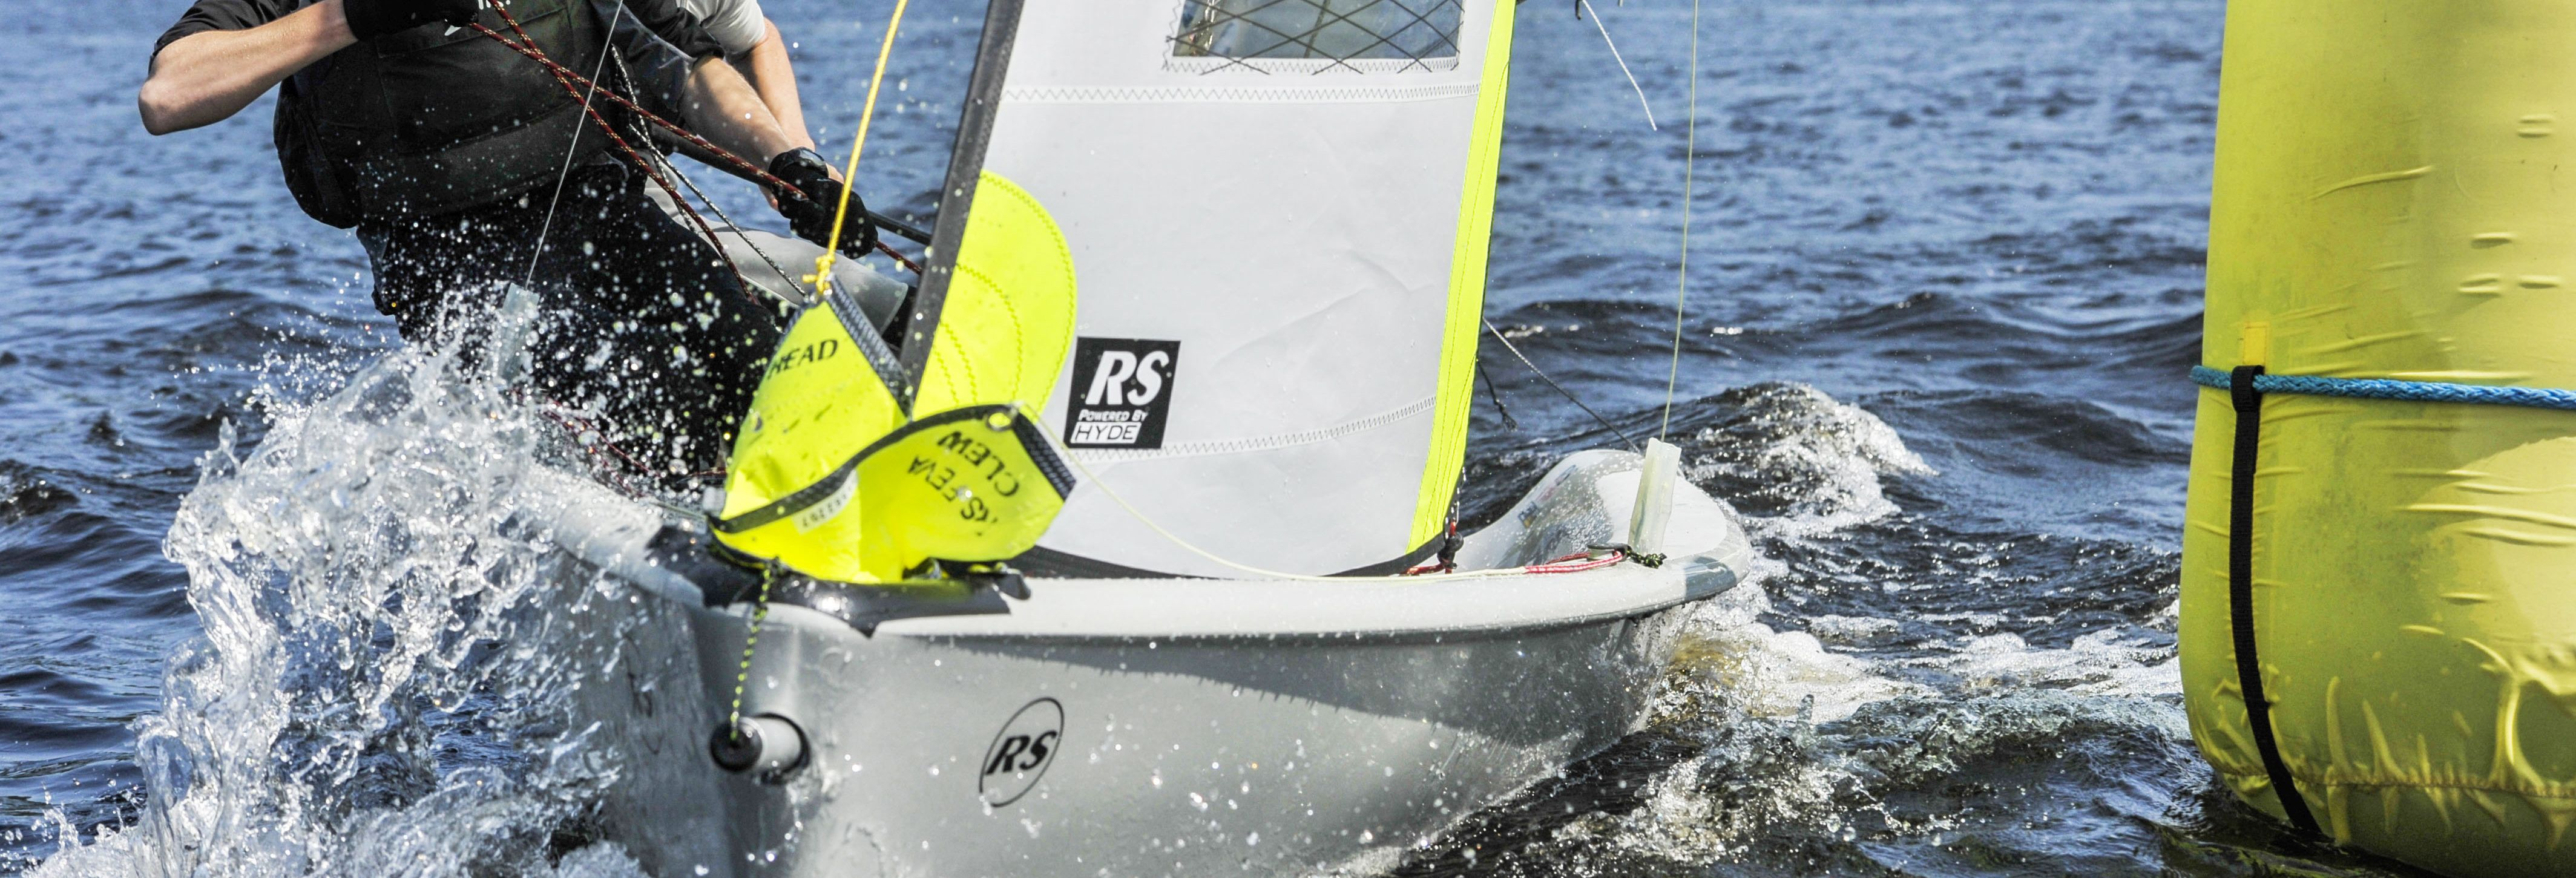 rs-sailing-rs-feva-sailboat-5.jpg